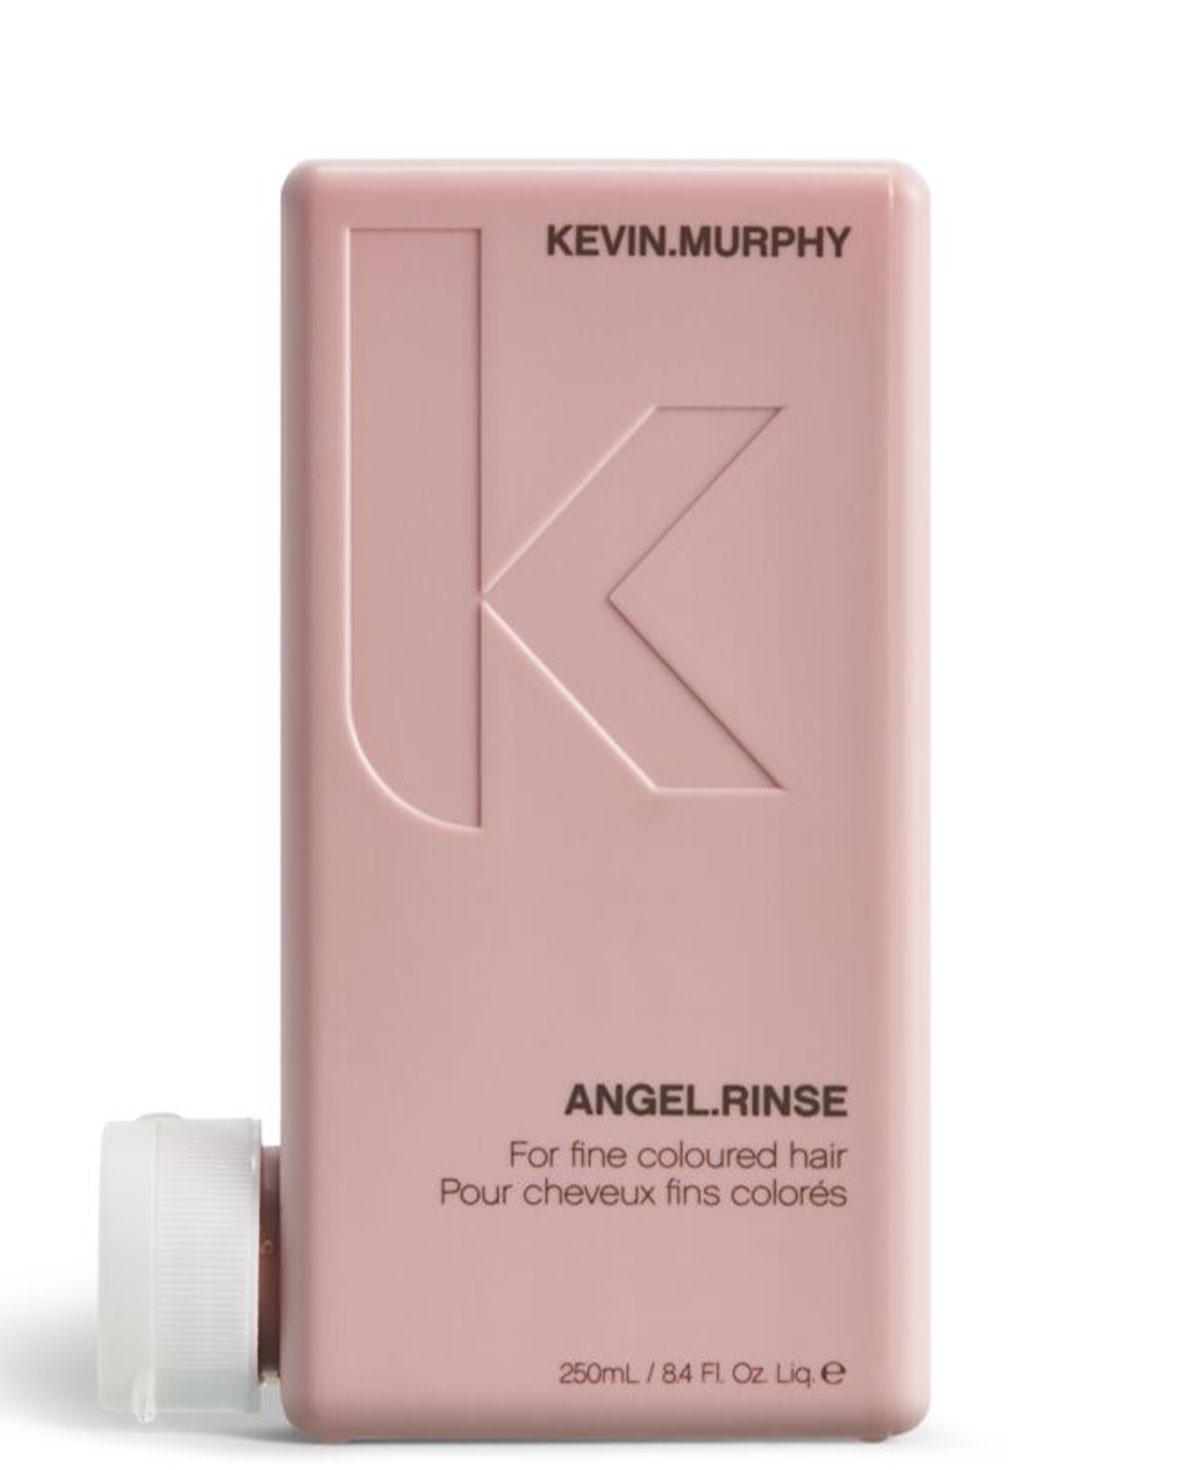 Kevin.Murphy ANGEL.RINSE 250ml